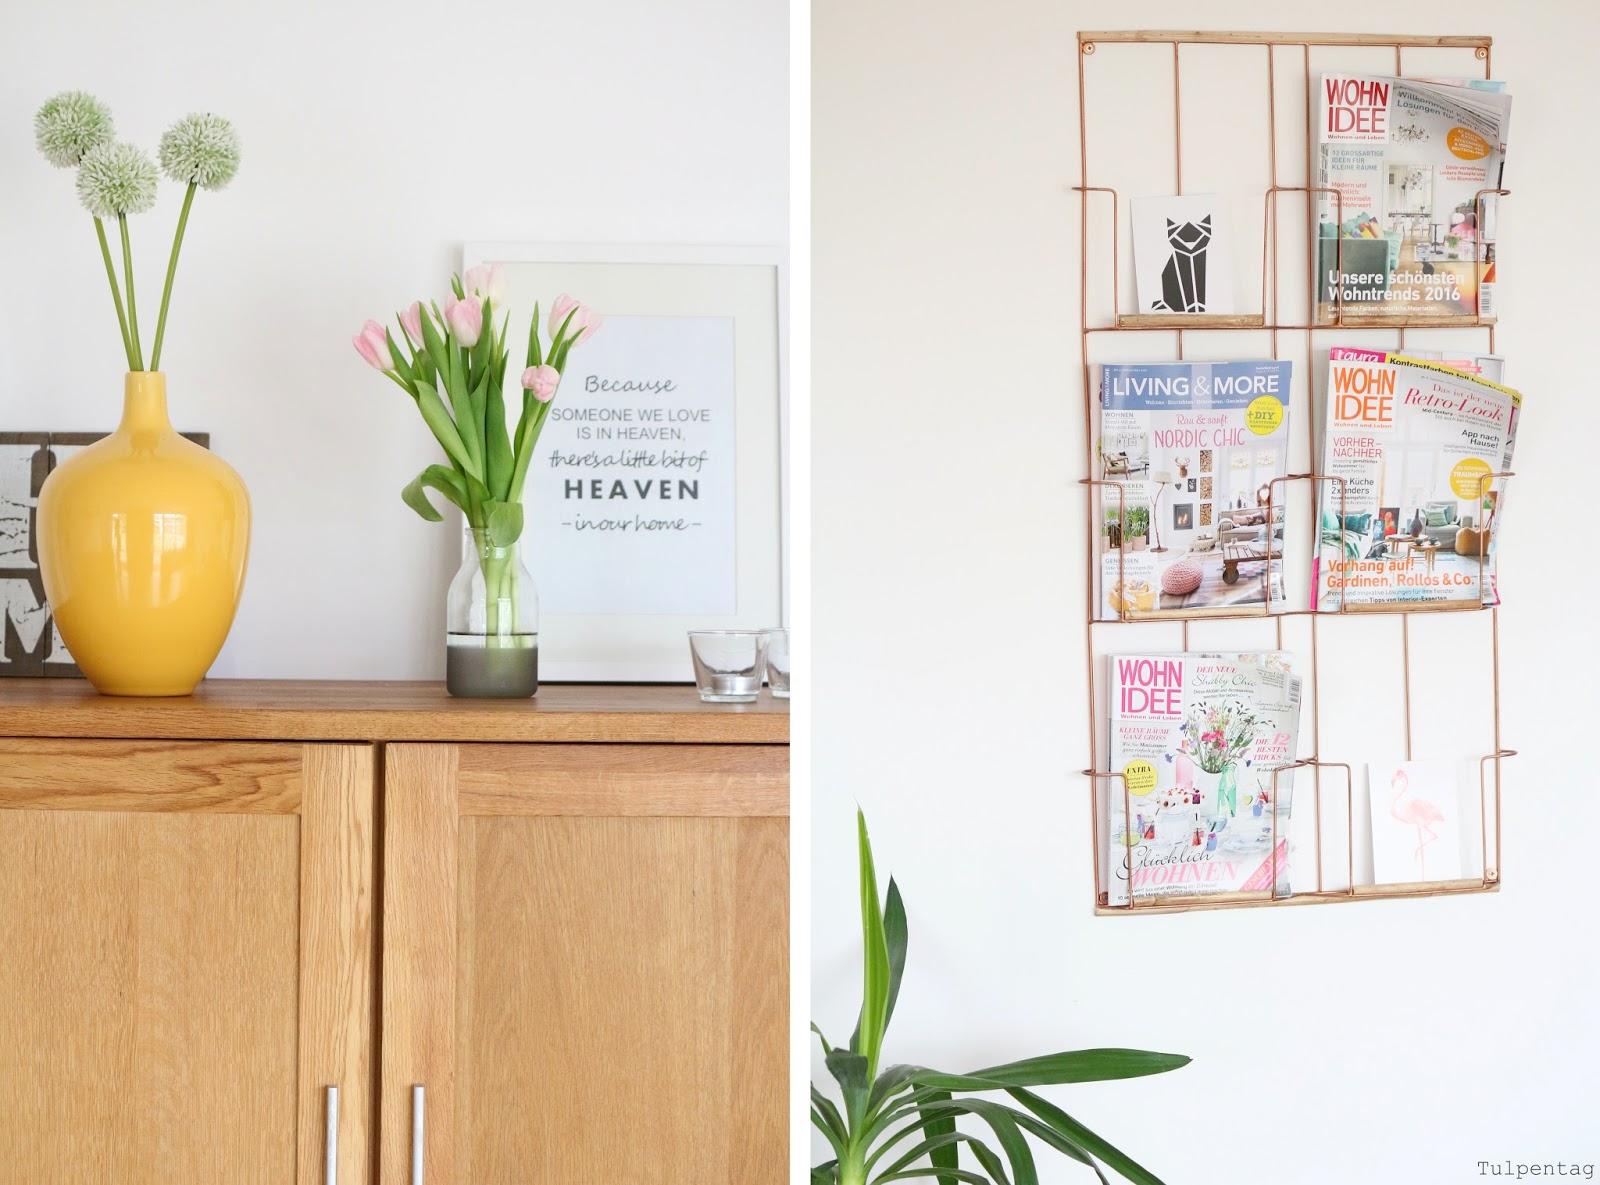 pastell deko und tulpen den fr hling ins haus holen. Black Bedroom Furniture Sets. Home Design Ideas